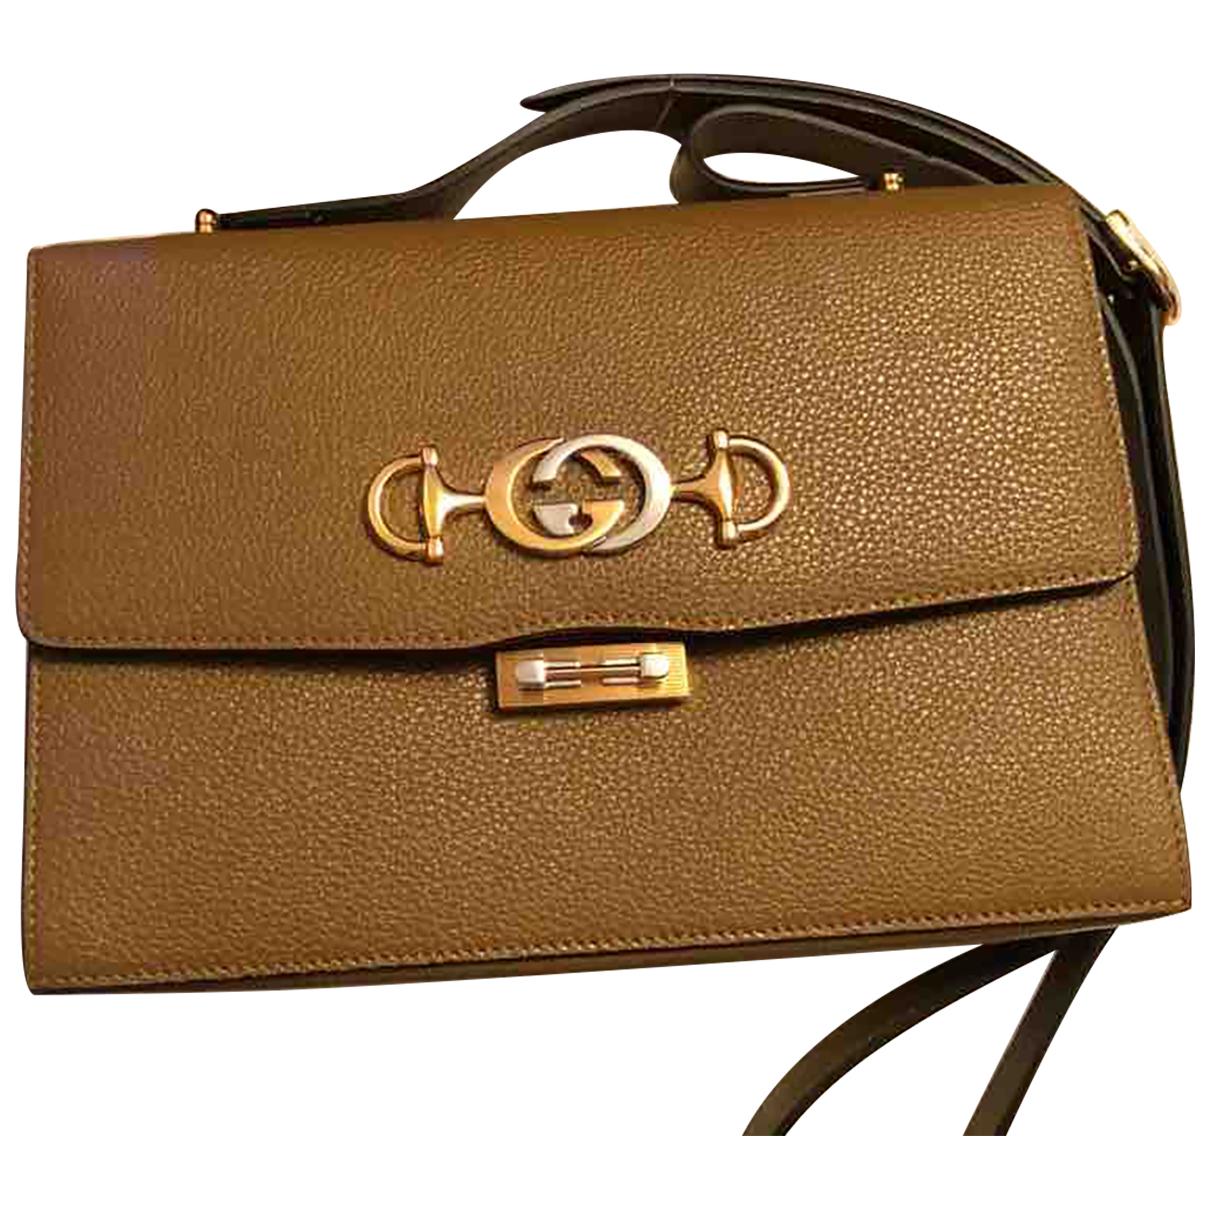 Gucci Zumi Brown Leather handbag for Women N